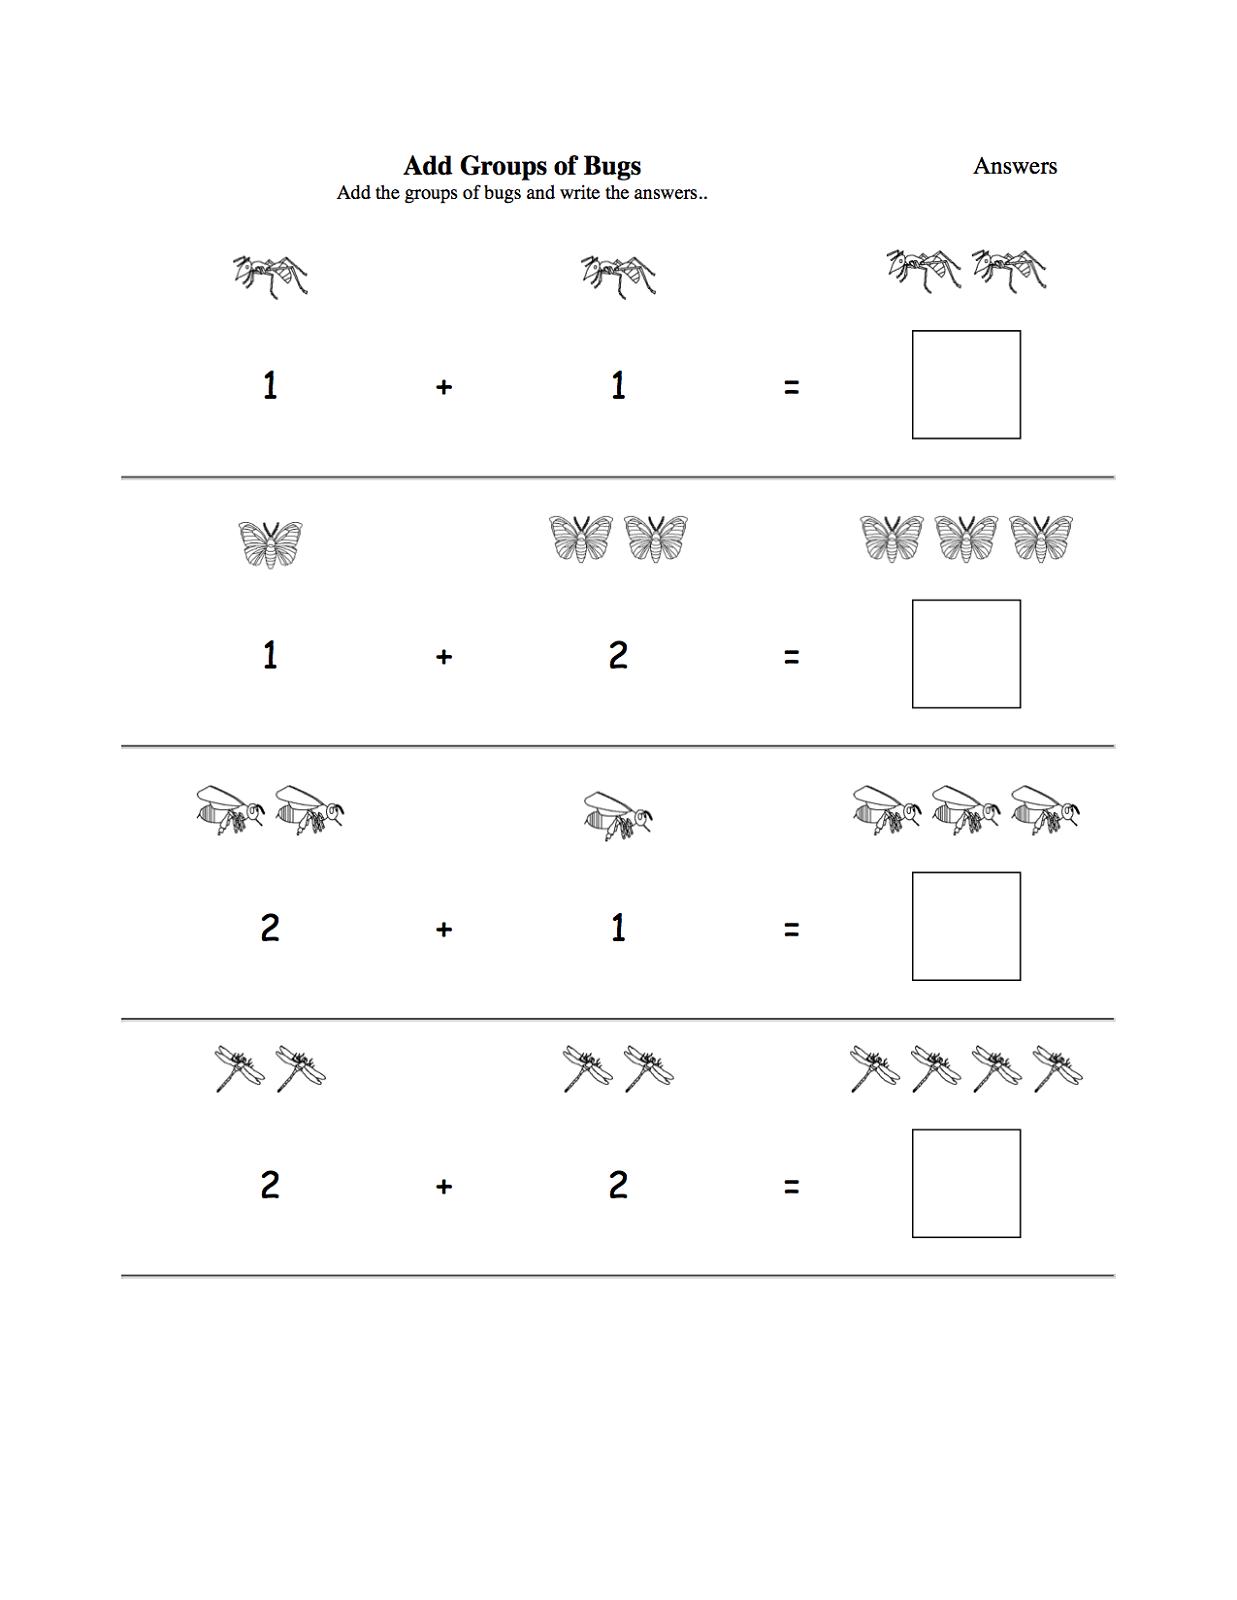 Animal Addition Worksheet